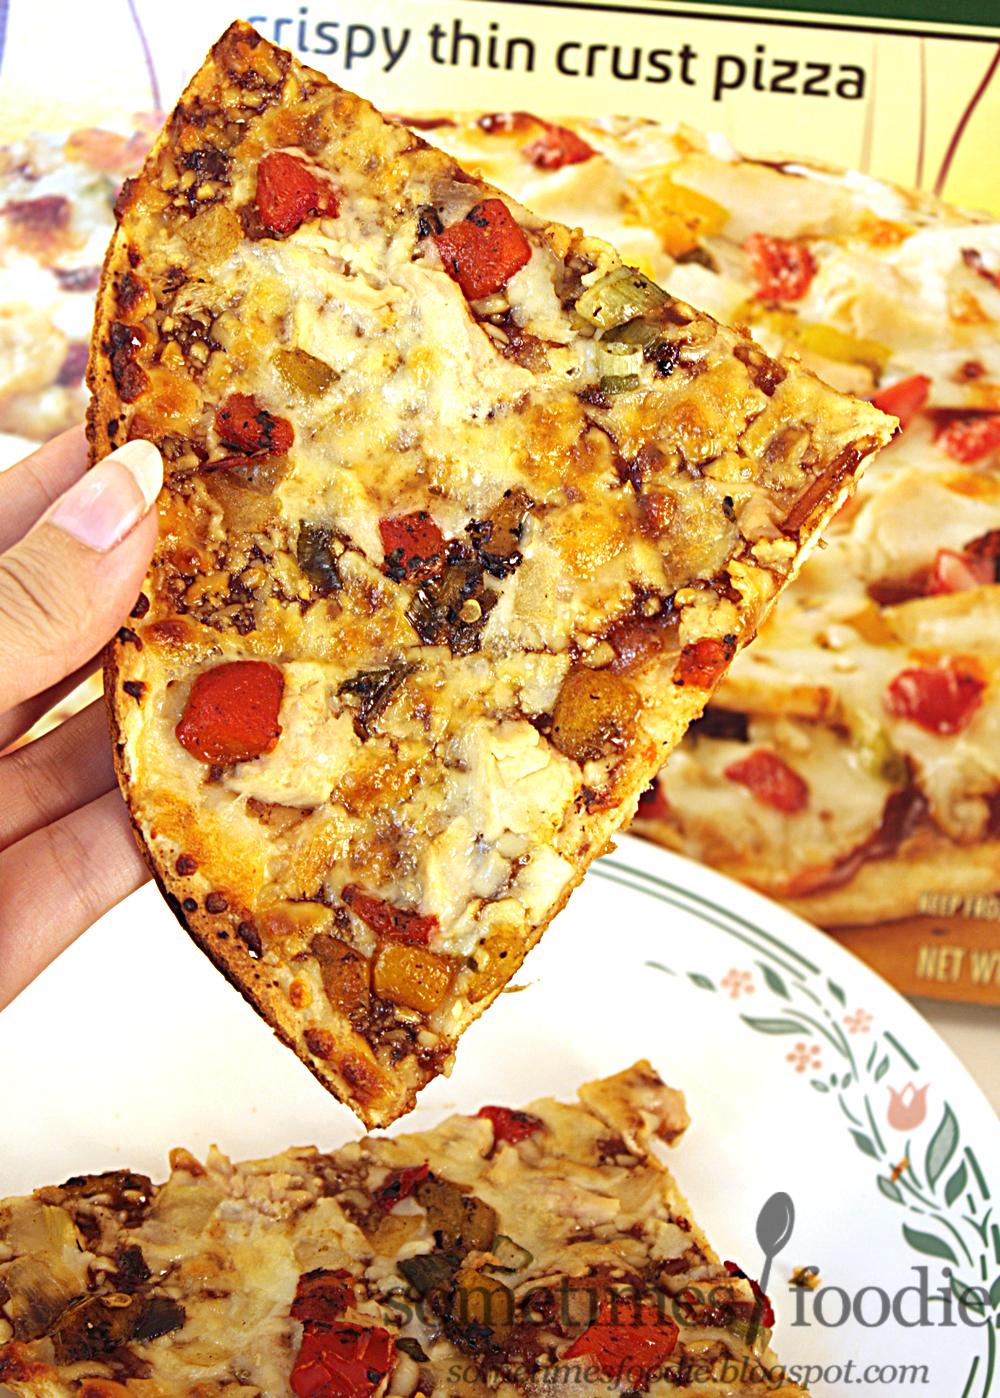 Sometimes Foodie Grilled Chicken With Jerk Sauce Pizza Aldi Cherry Hill Nj